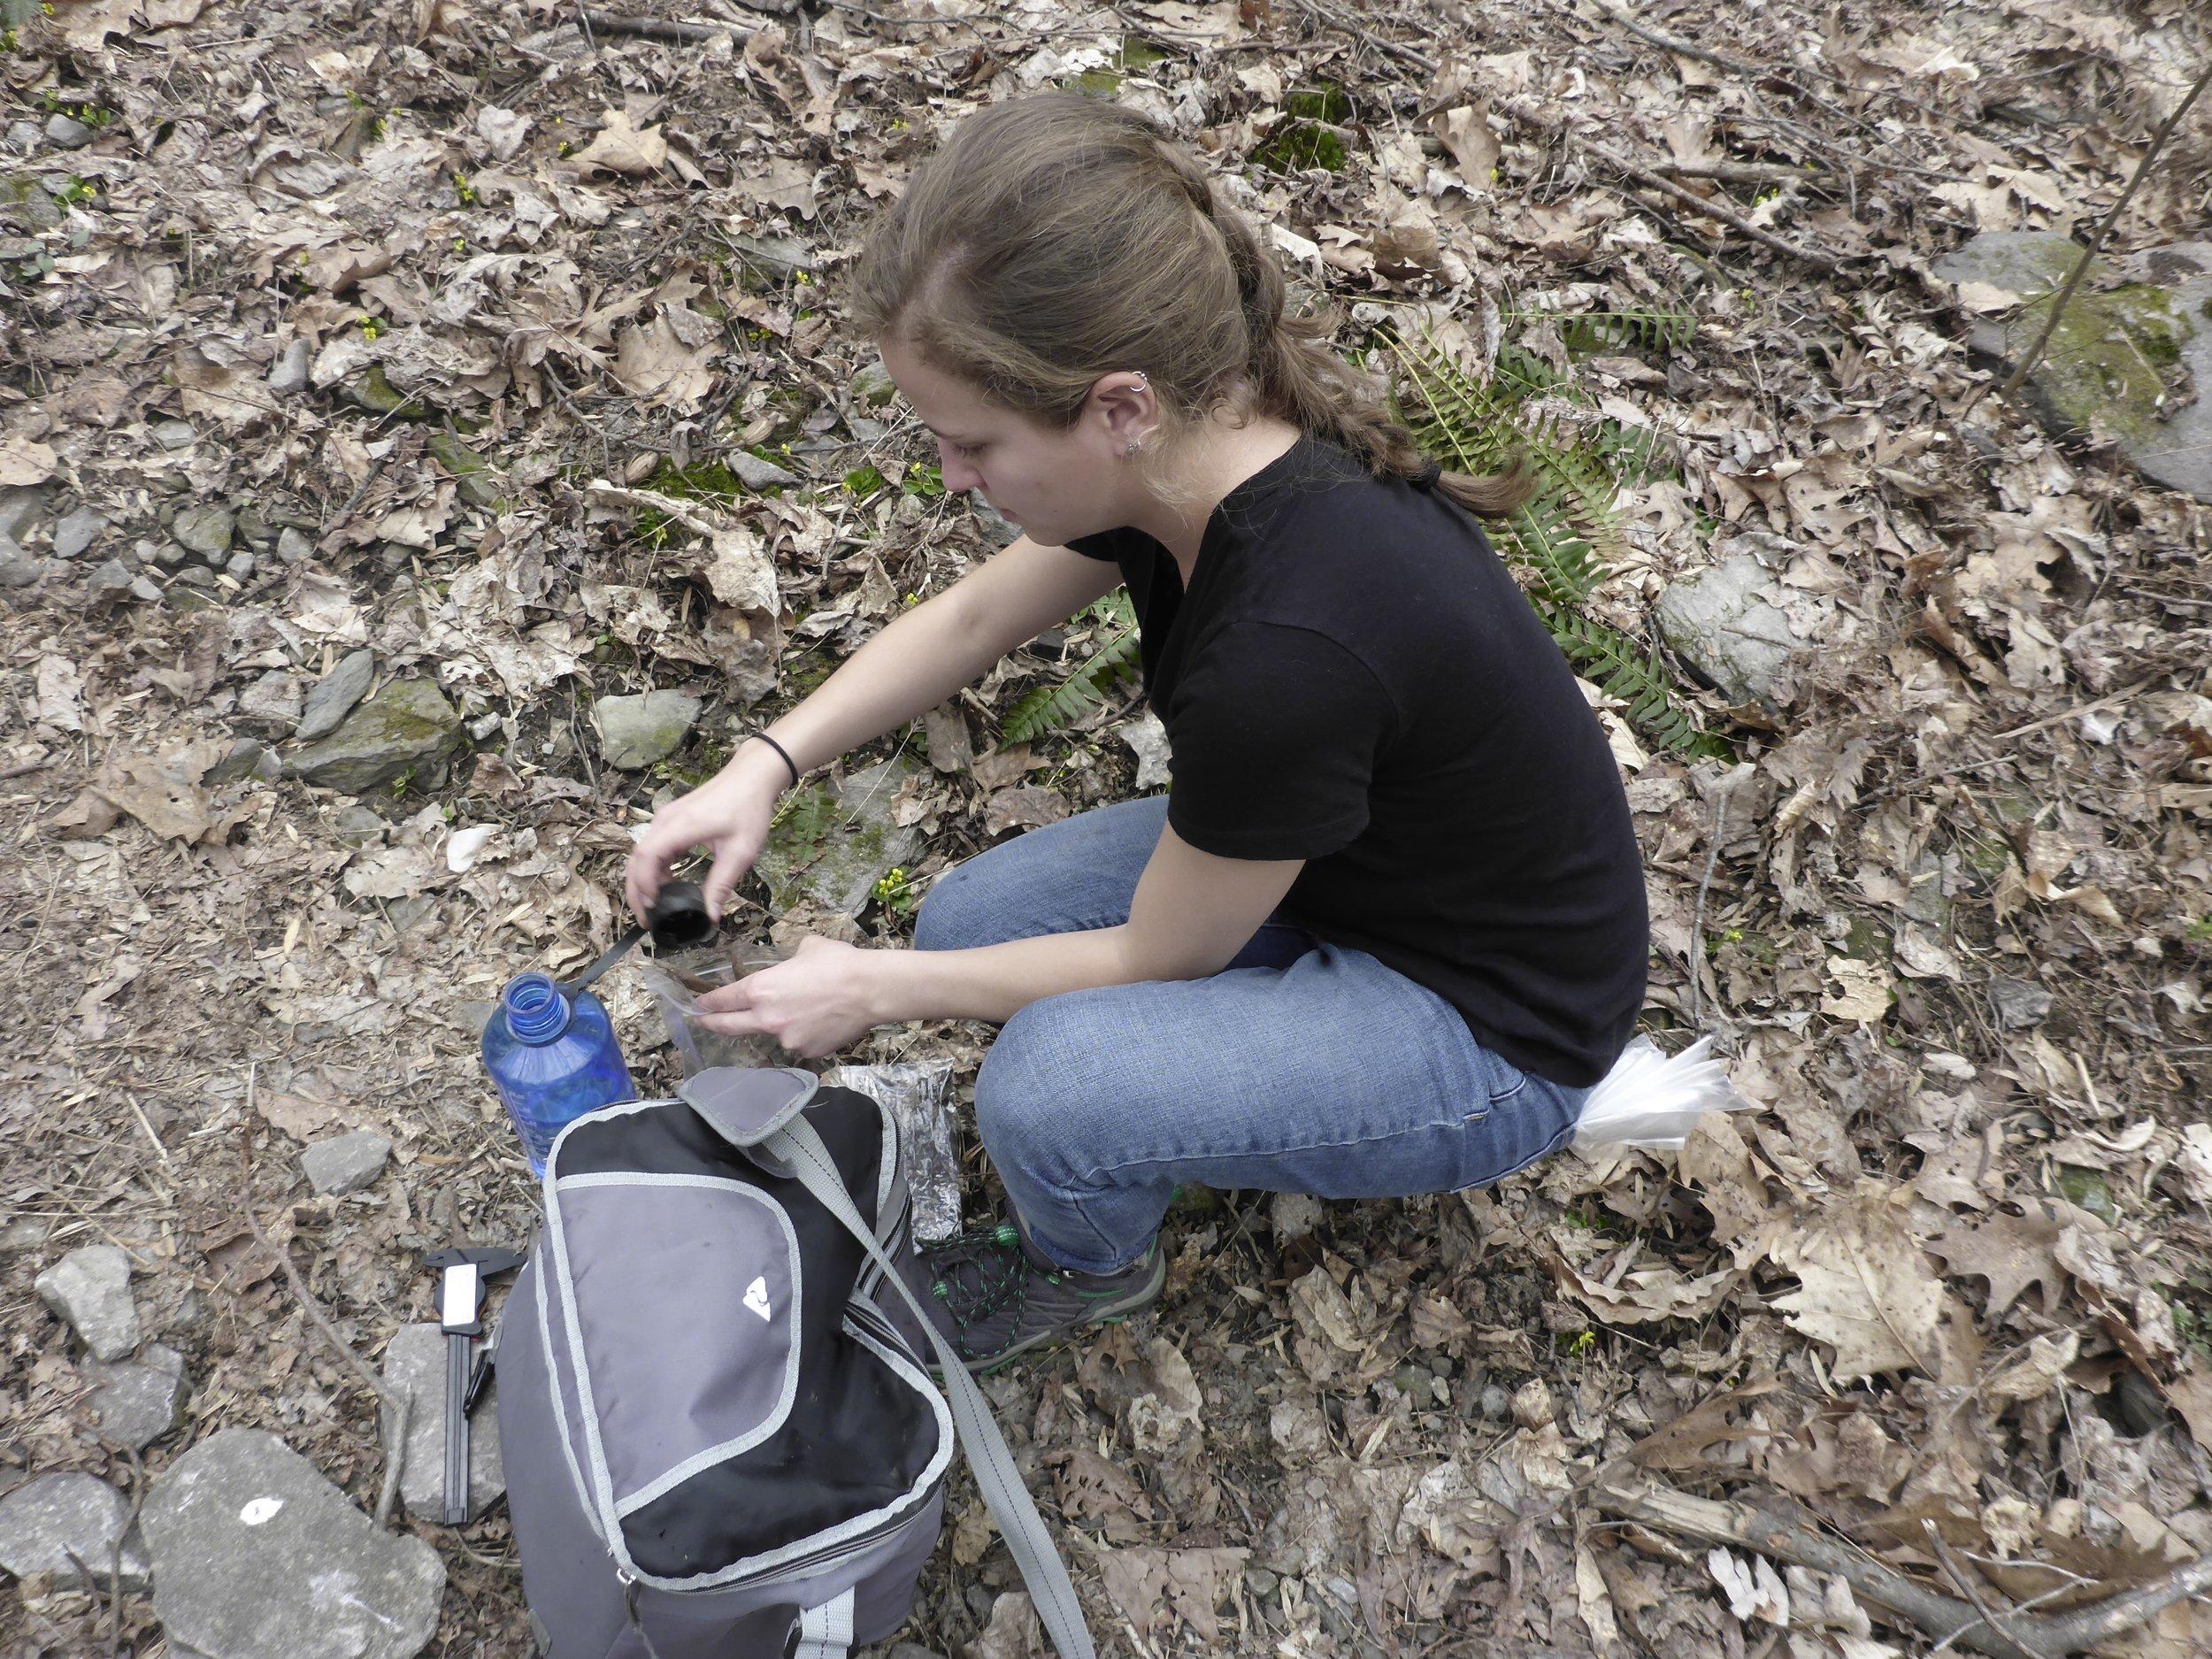 Tori packing up some salamanders